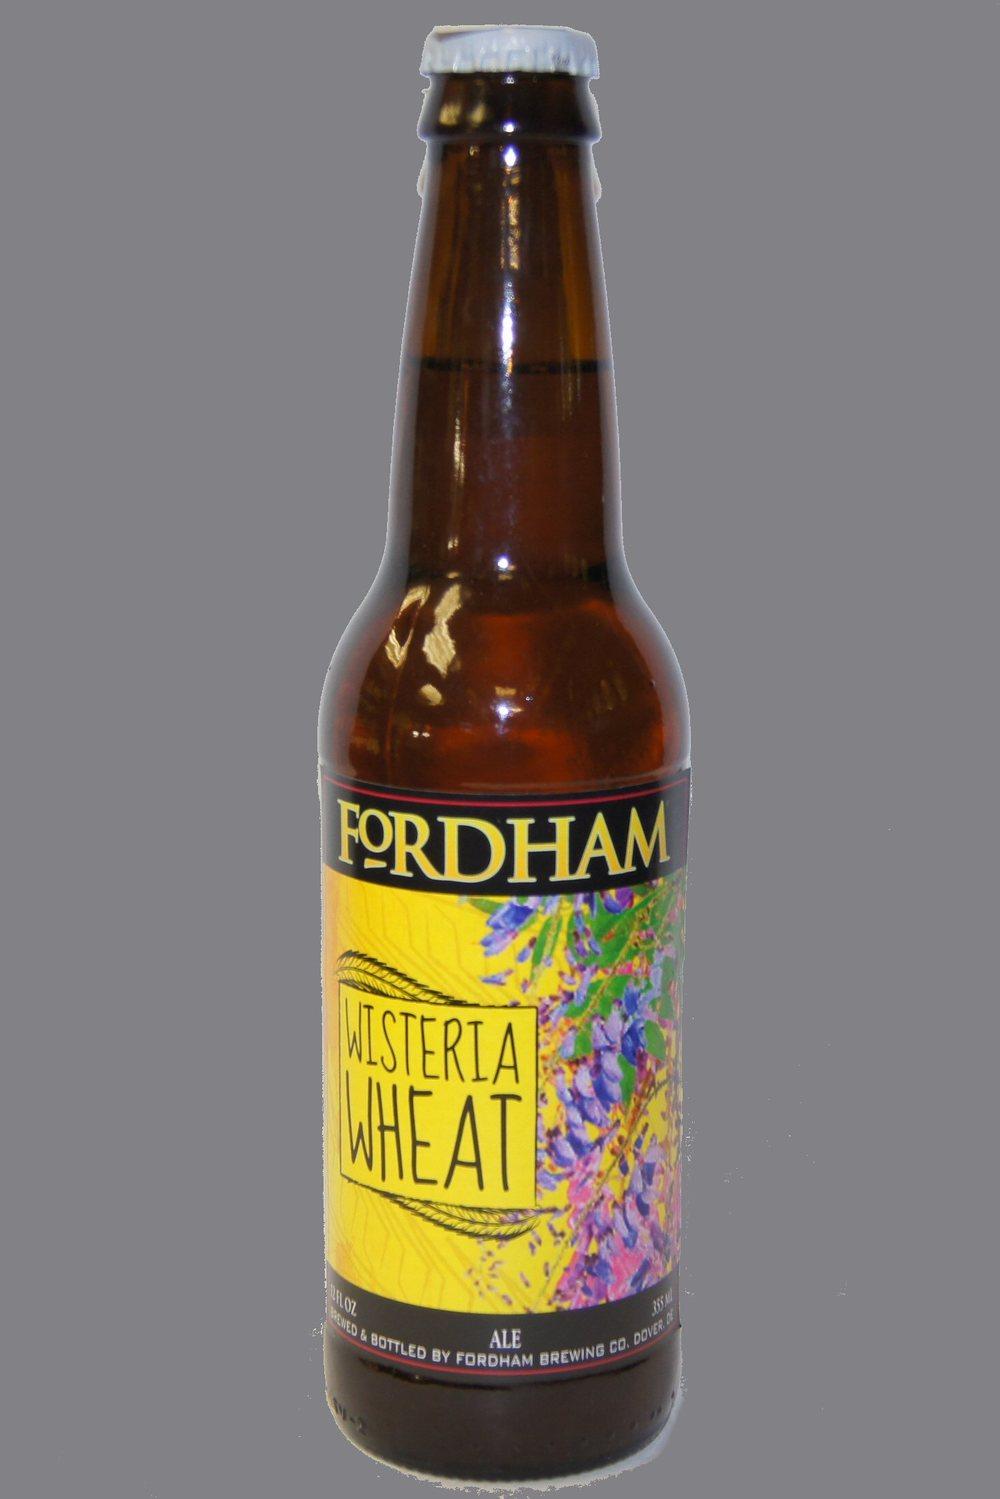 FORDHAM-Wisteria wheat.jpg